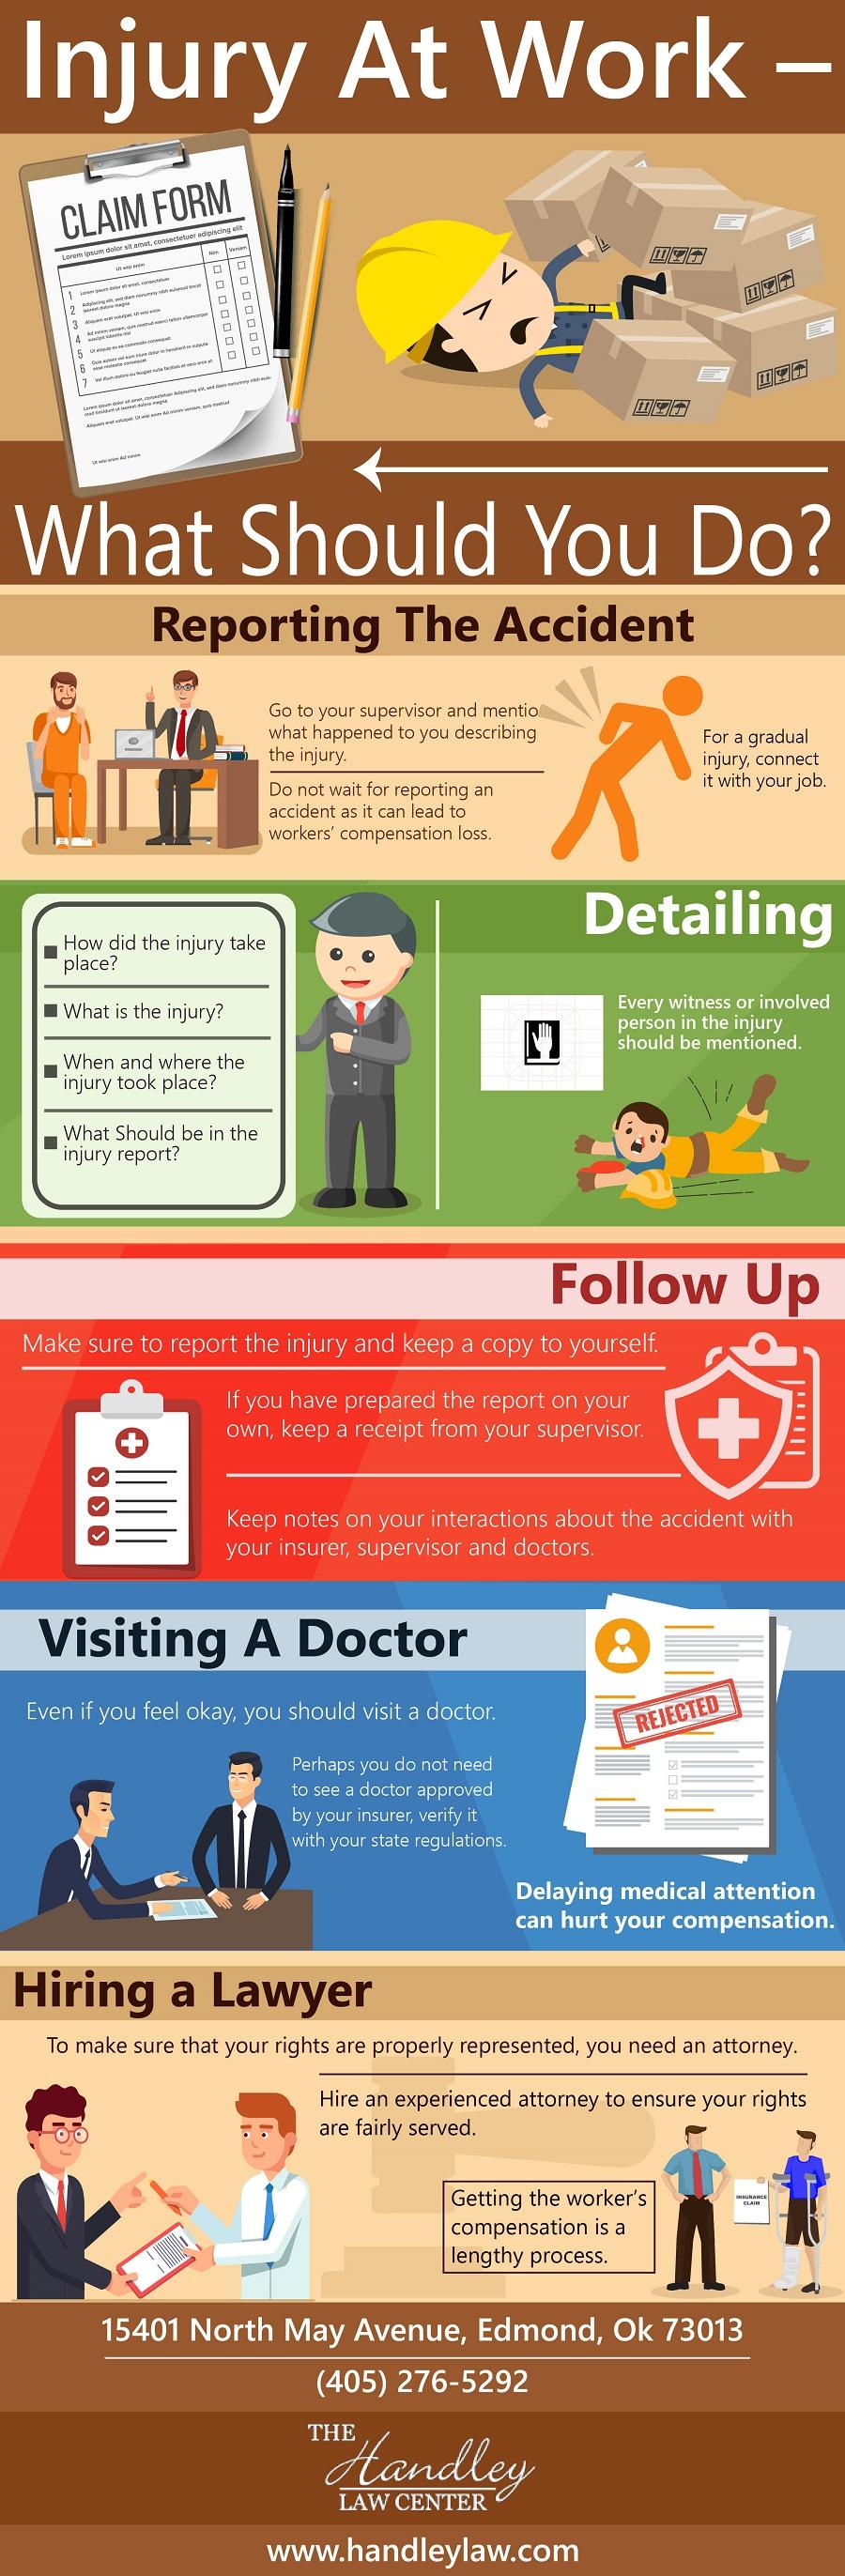 Injury At Work Infographic